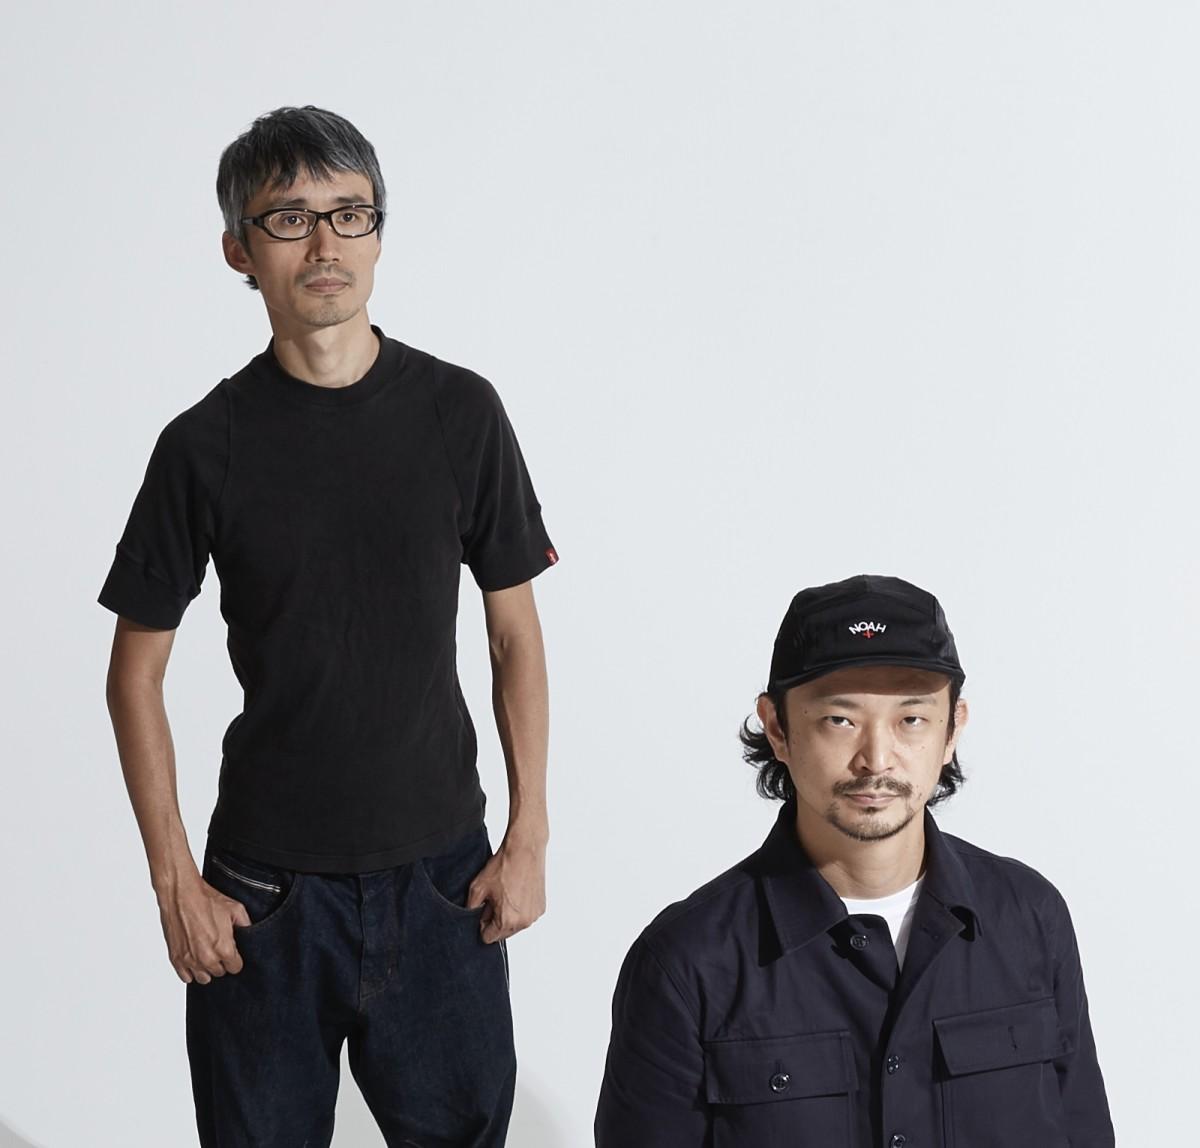 Sónar istanbul+D | 真鍋大度・堀井哲史がライブパフォーマンス出演、真鍋大度がキーノート講演に参加